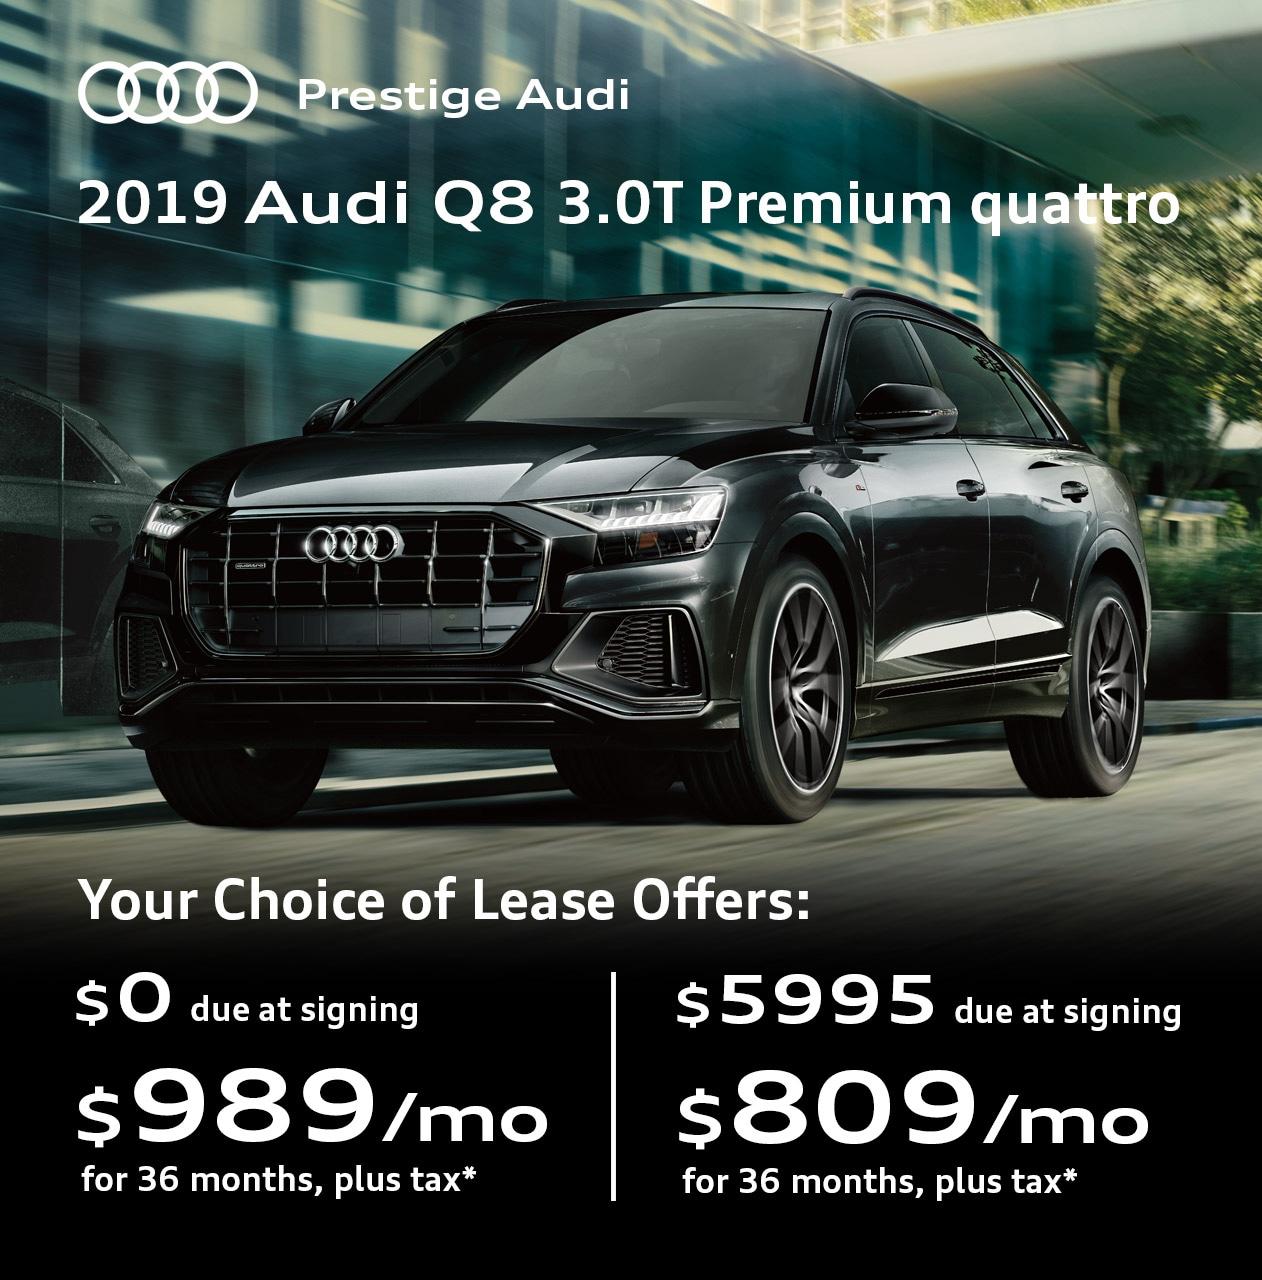 Lease Deals & Offers At Prestige Audi Near